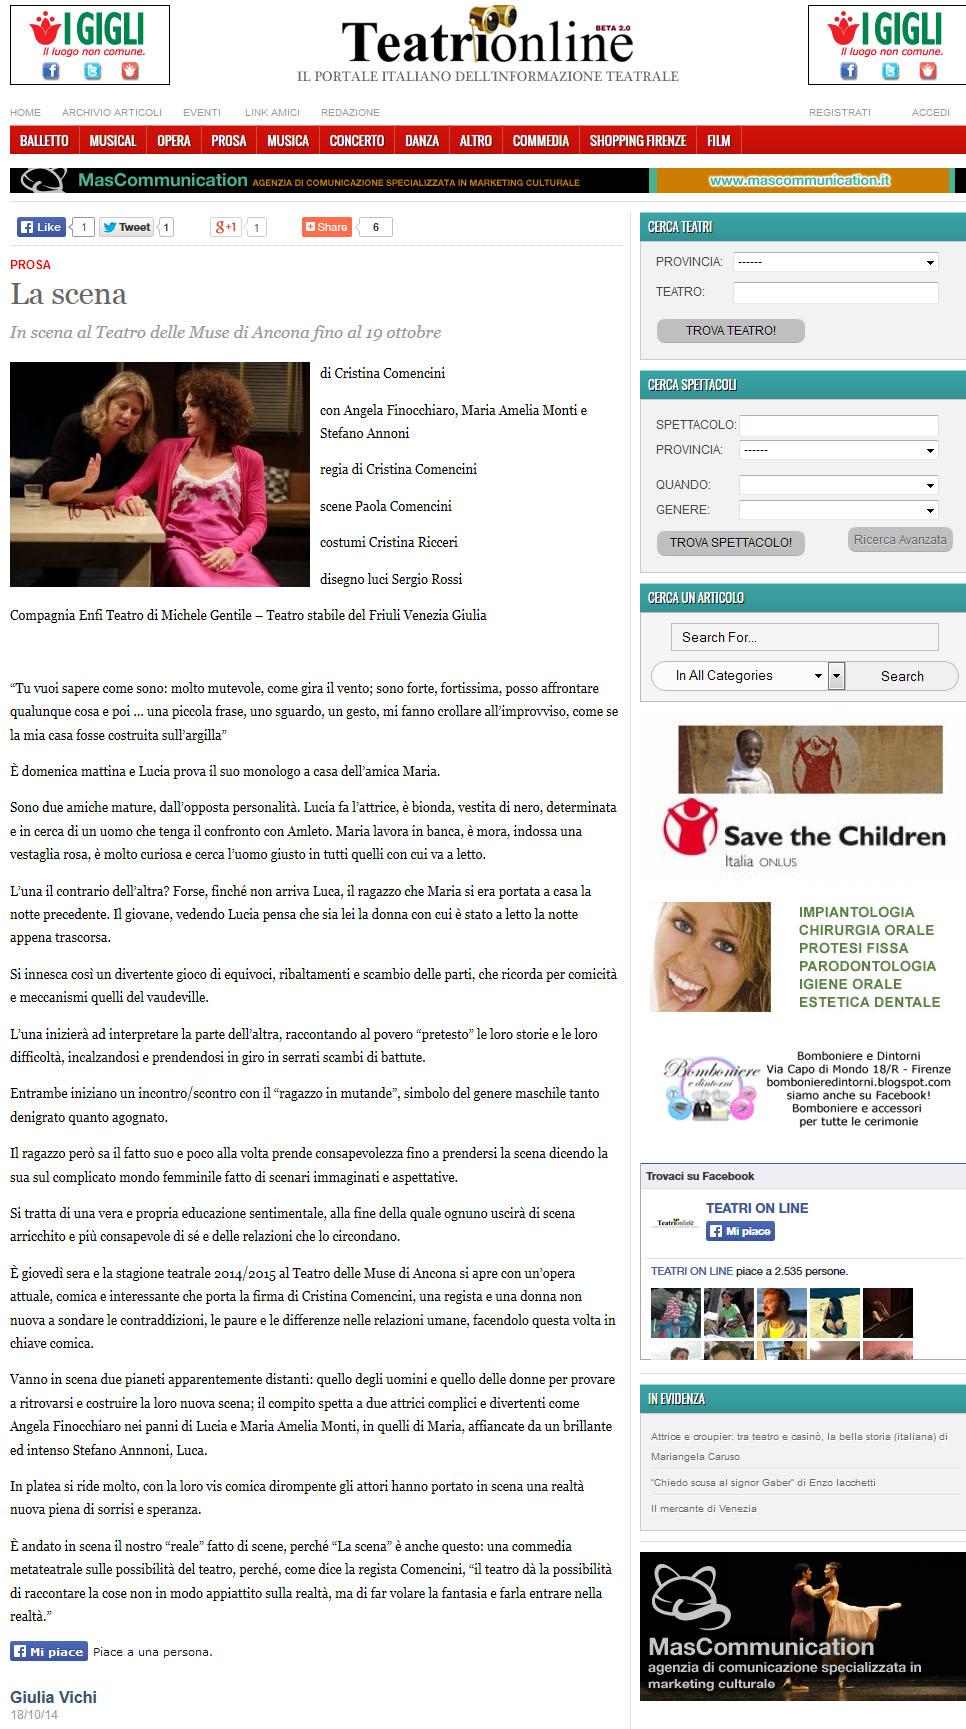 2014.10.18 la scena - teatrionline.com